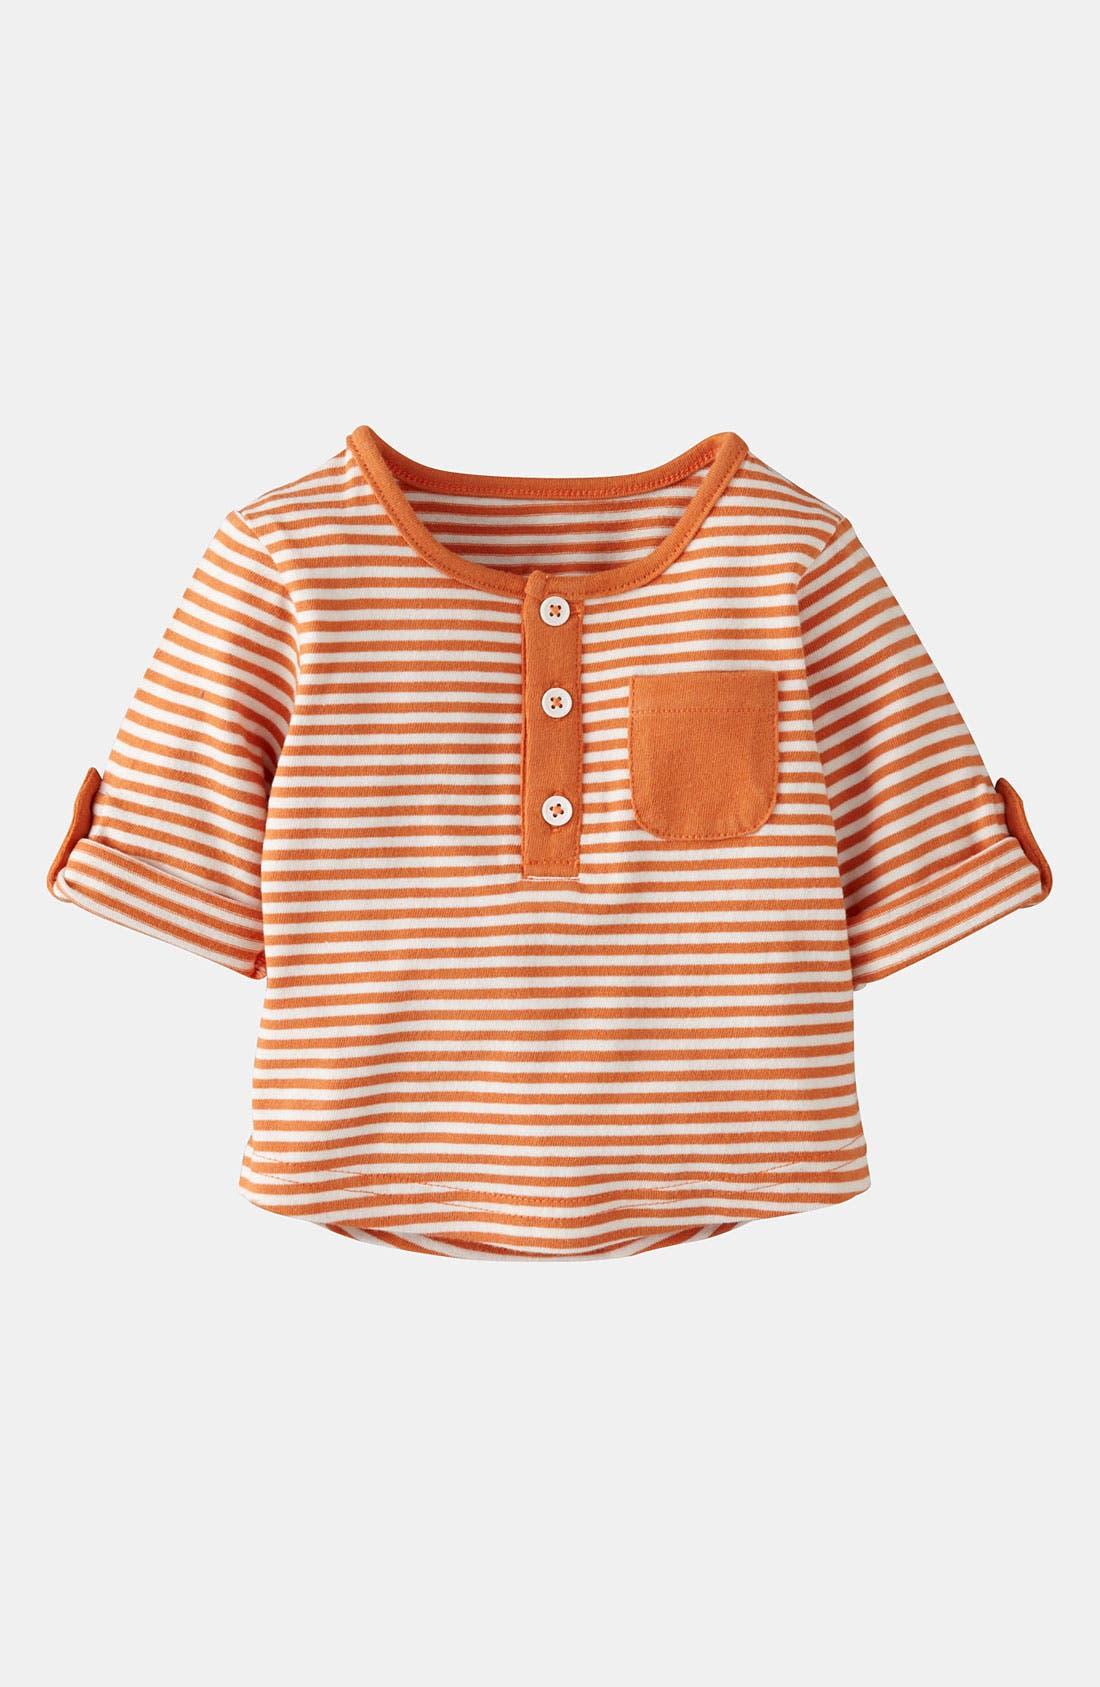 Main Image - Mini Boden Henley Shirt (Baby)